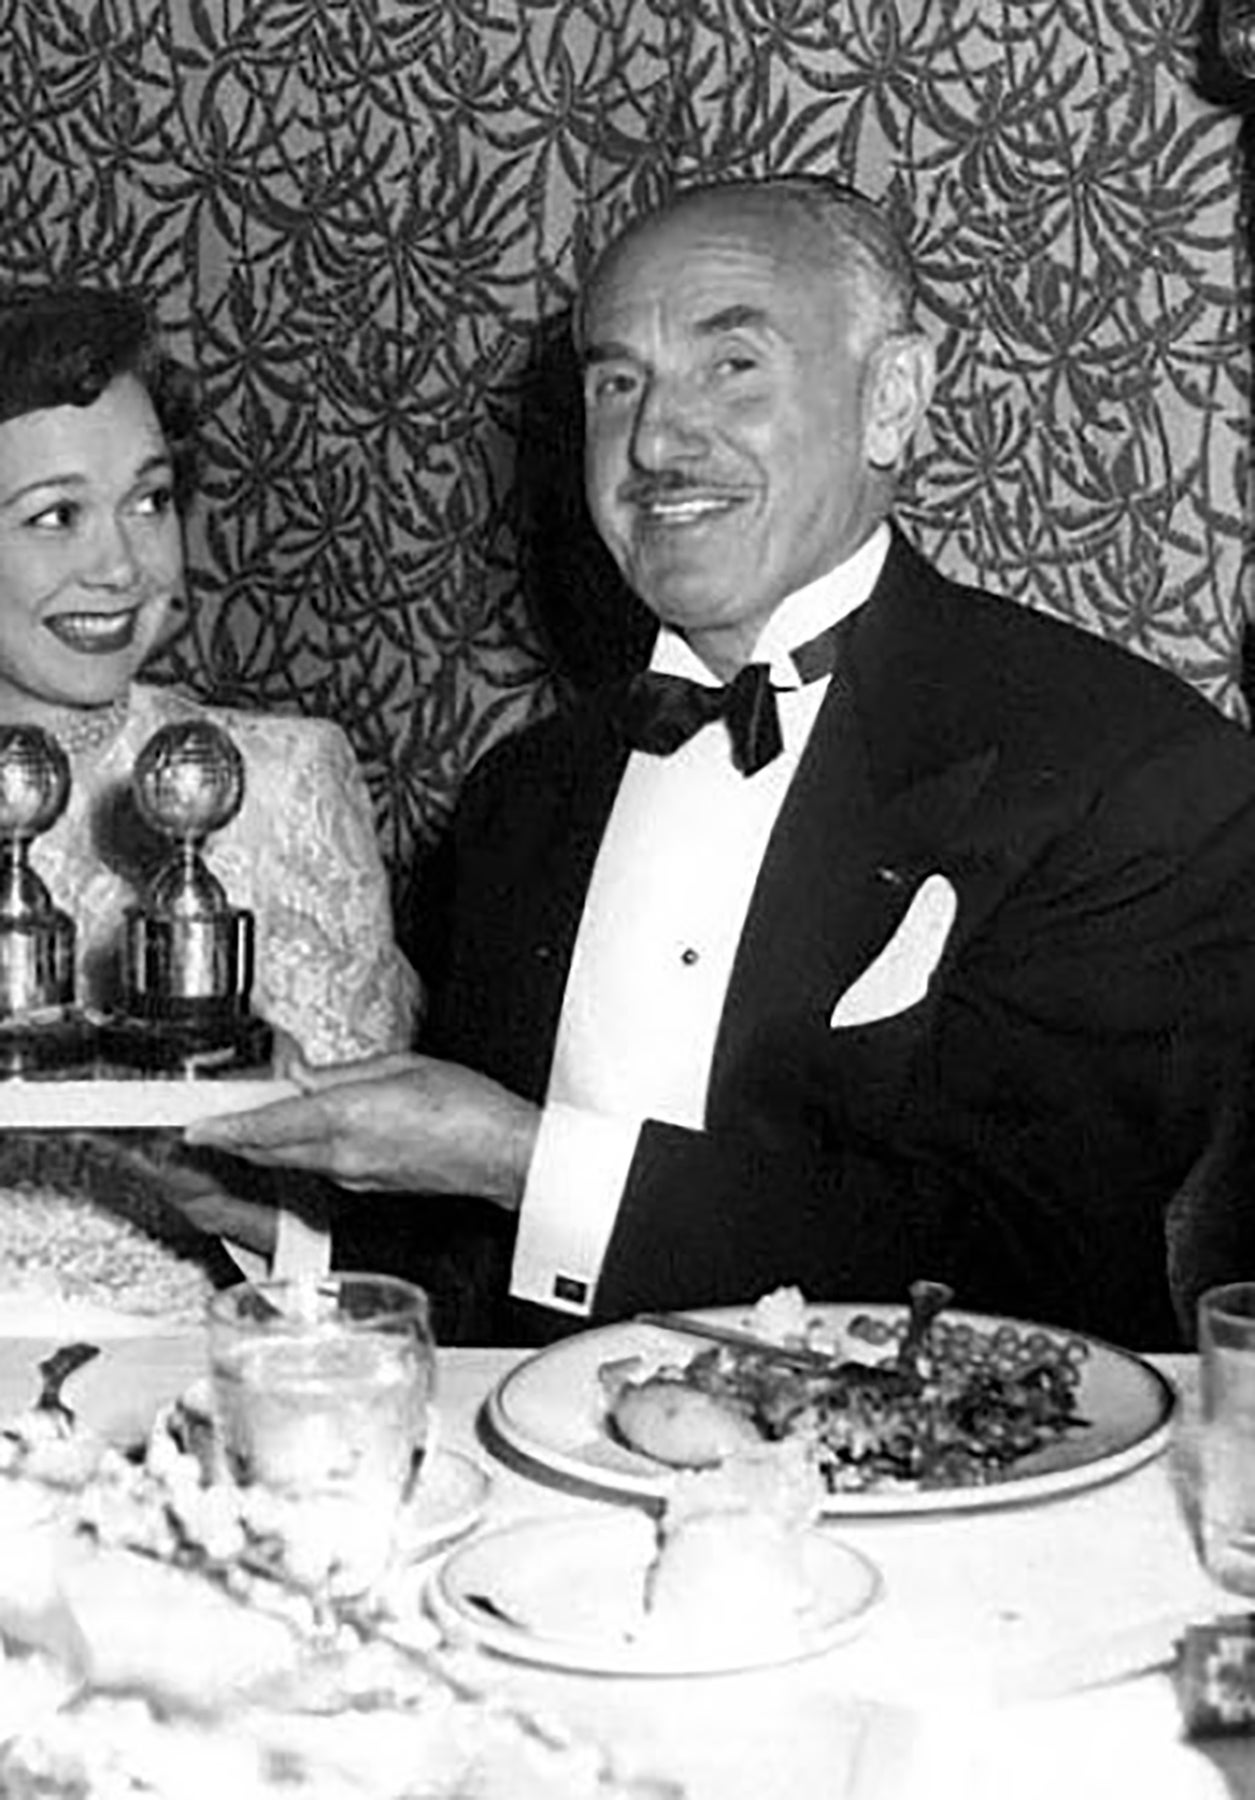 Jane Wyman with Jack L. Warner in 1949